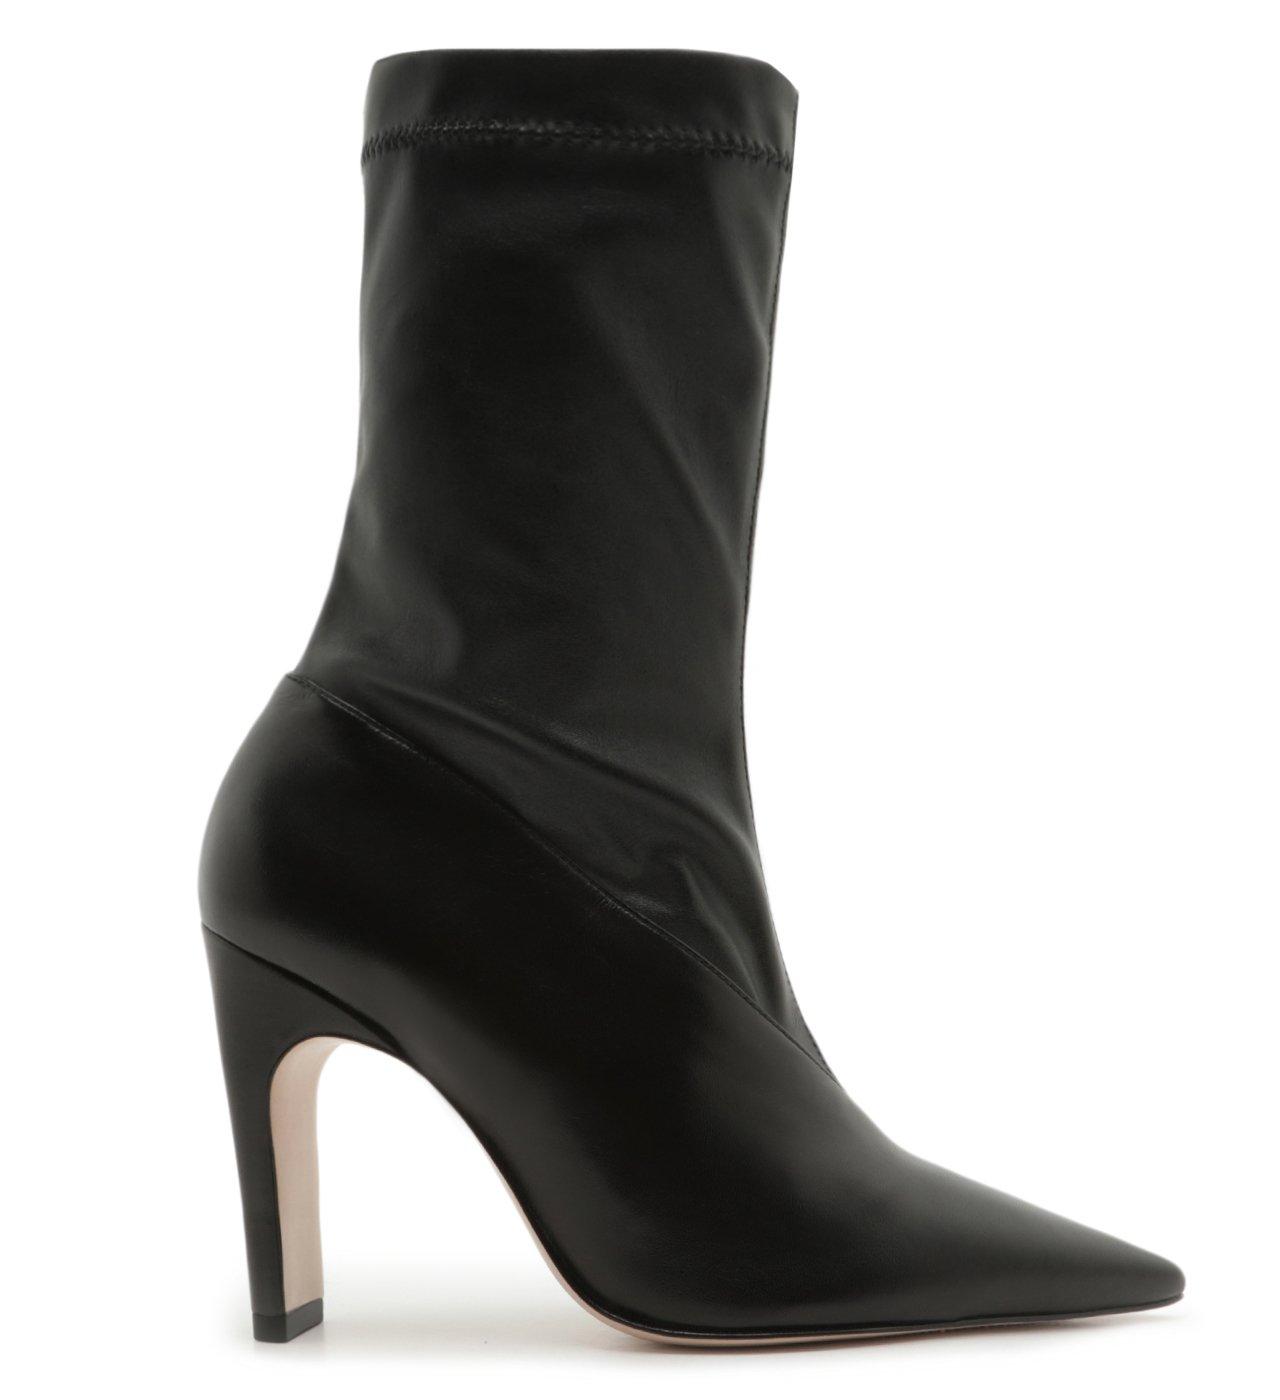 Sock Boot Ava Salto Black | Schutz